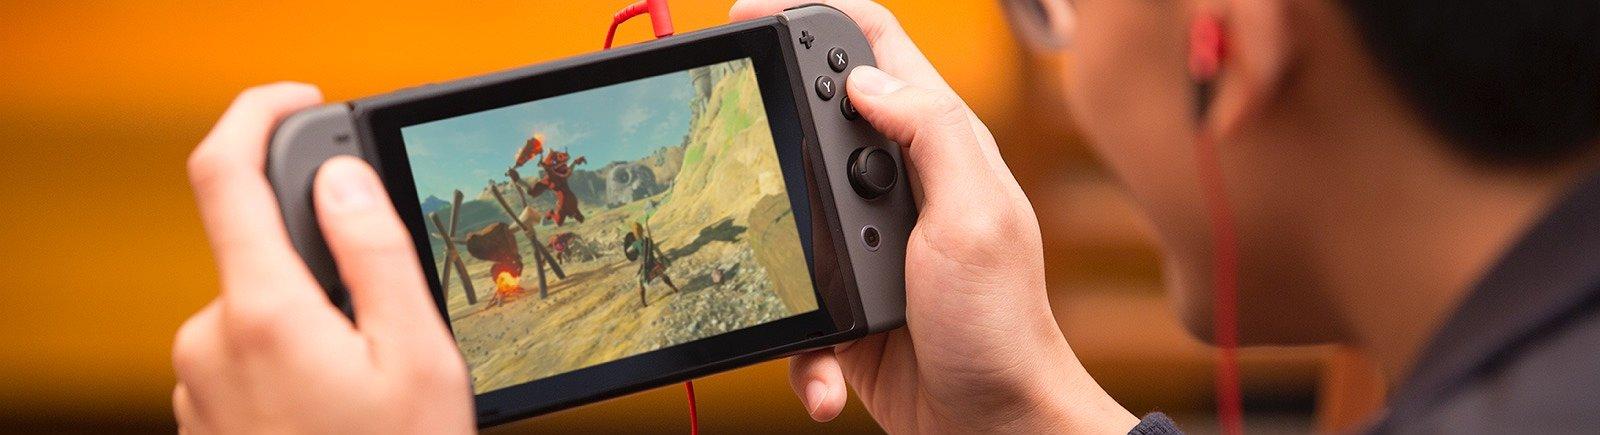 Nintendo Switch nos ofrece un nuevo concepto de consola